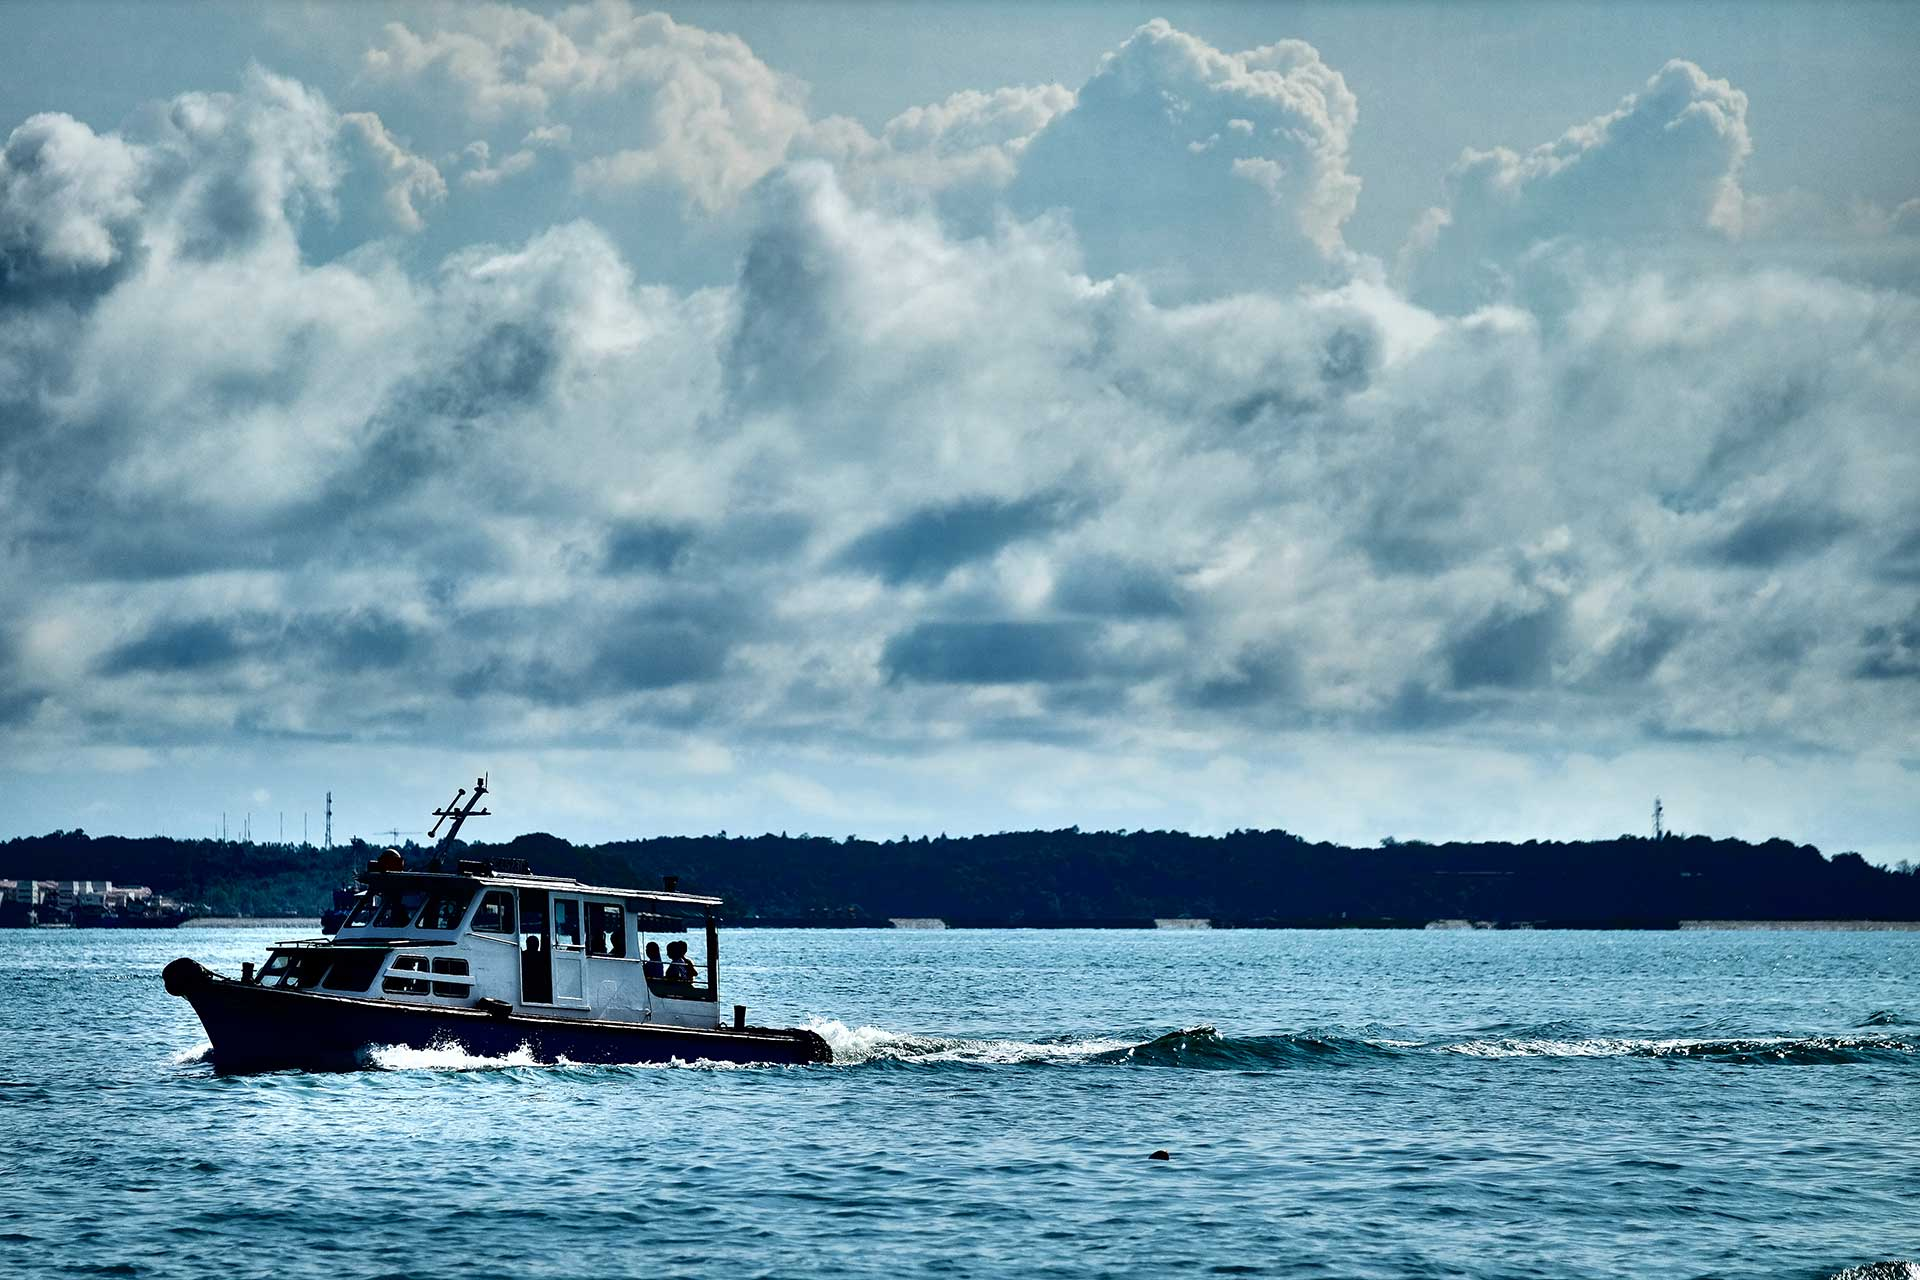 Pictorial Pulau Ubin Boat